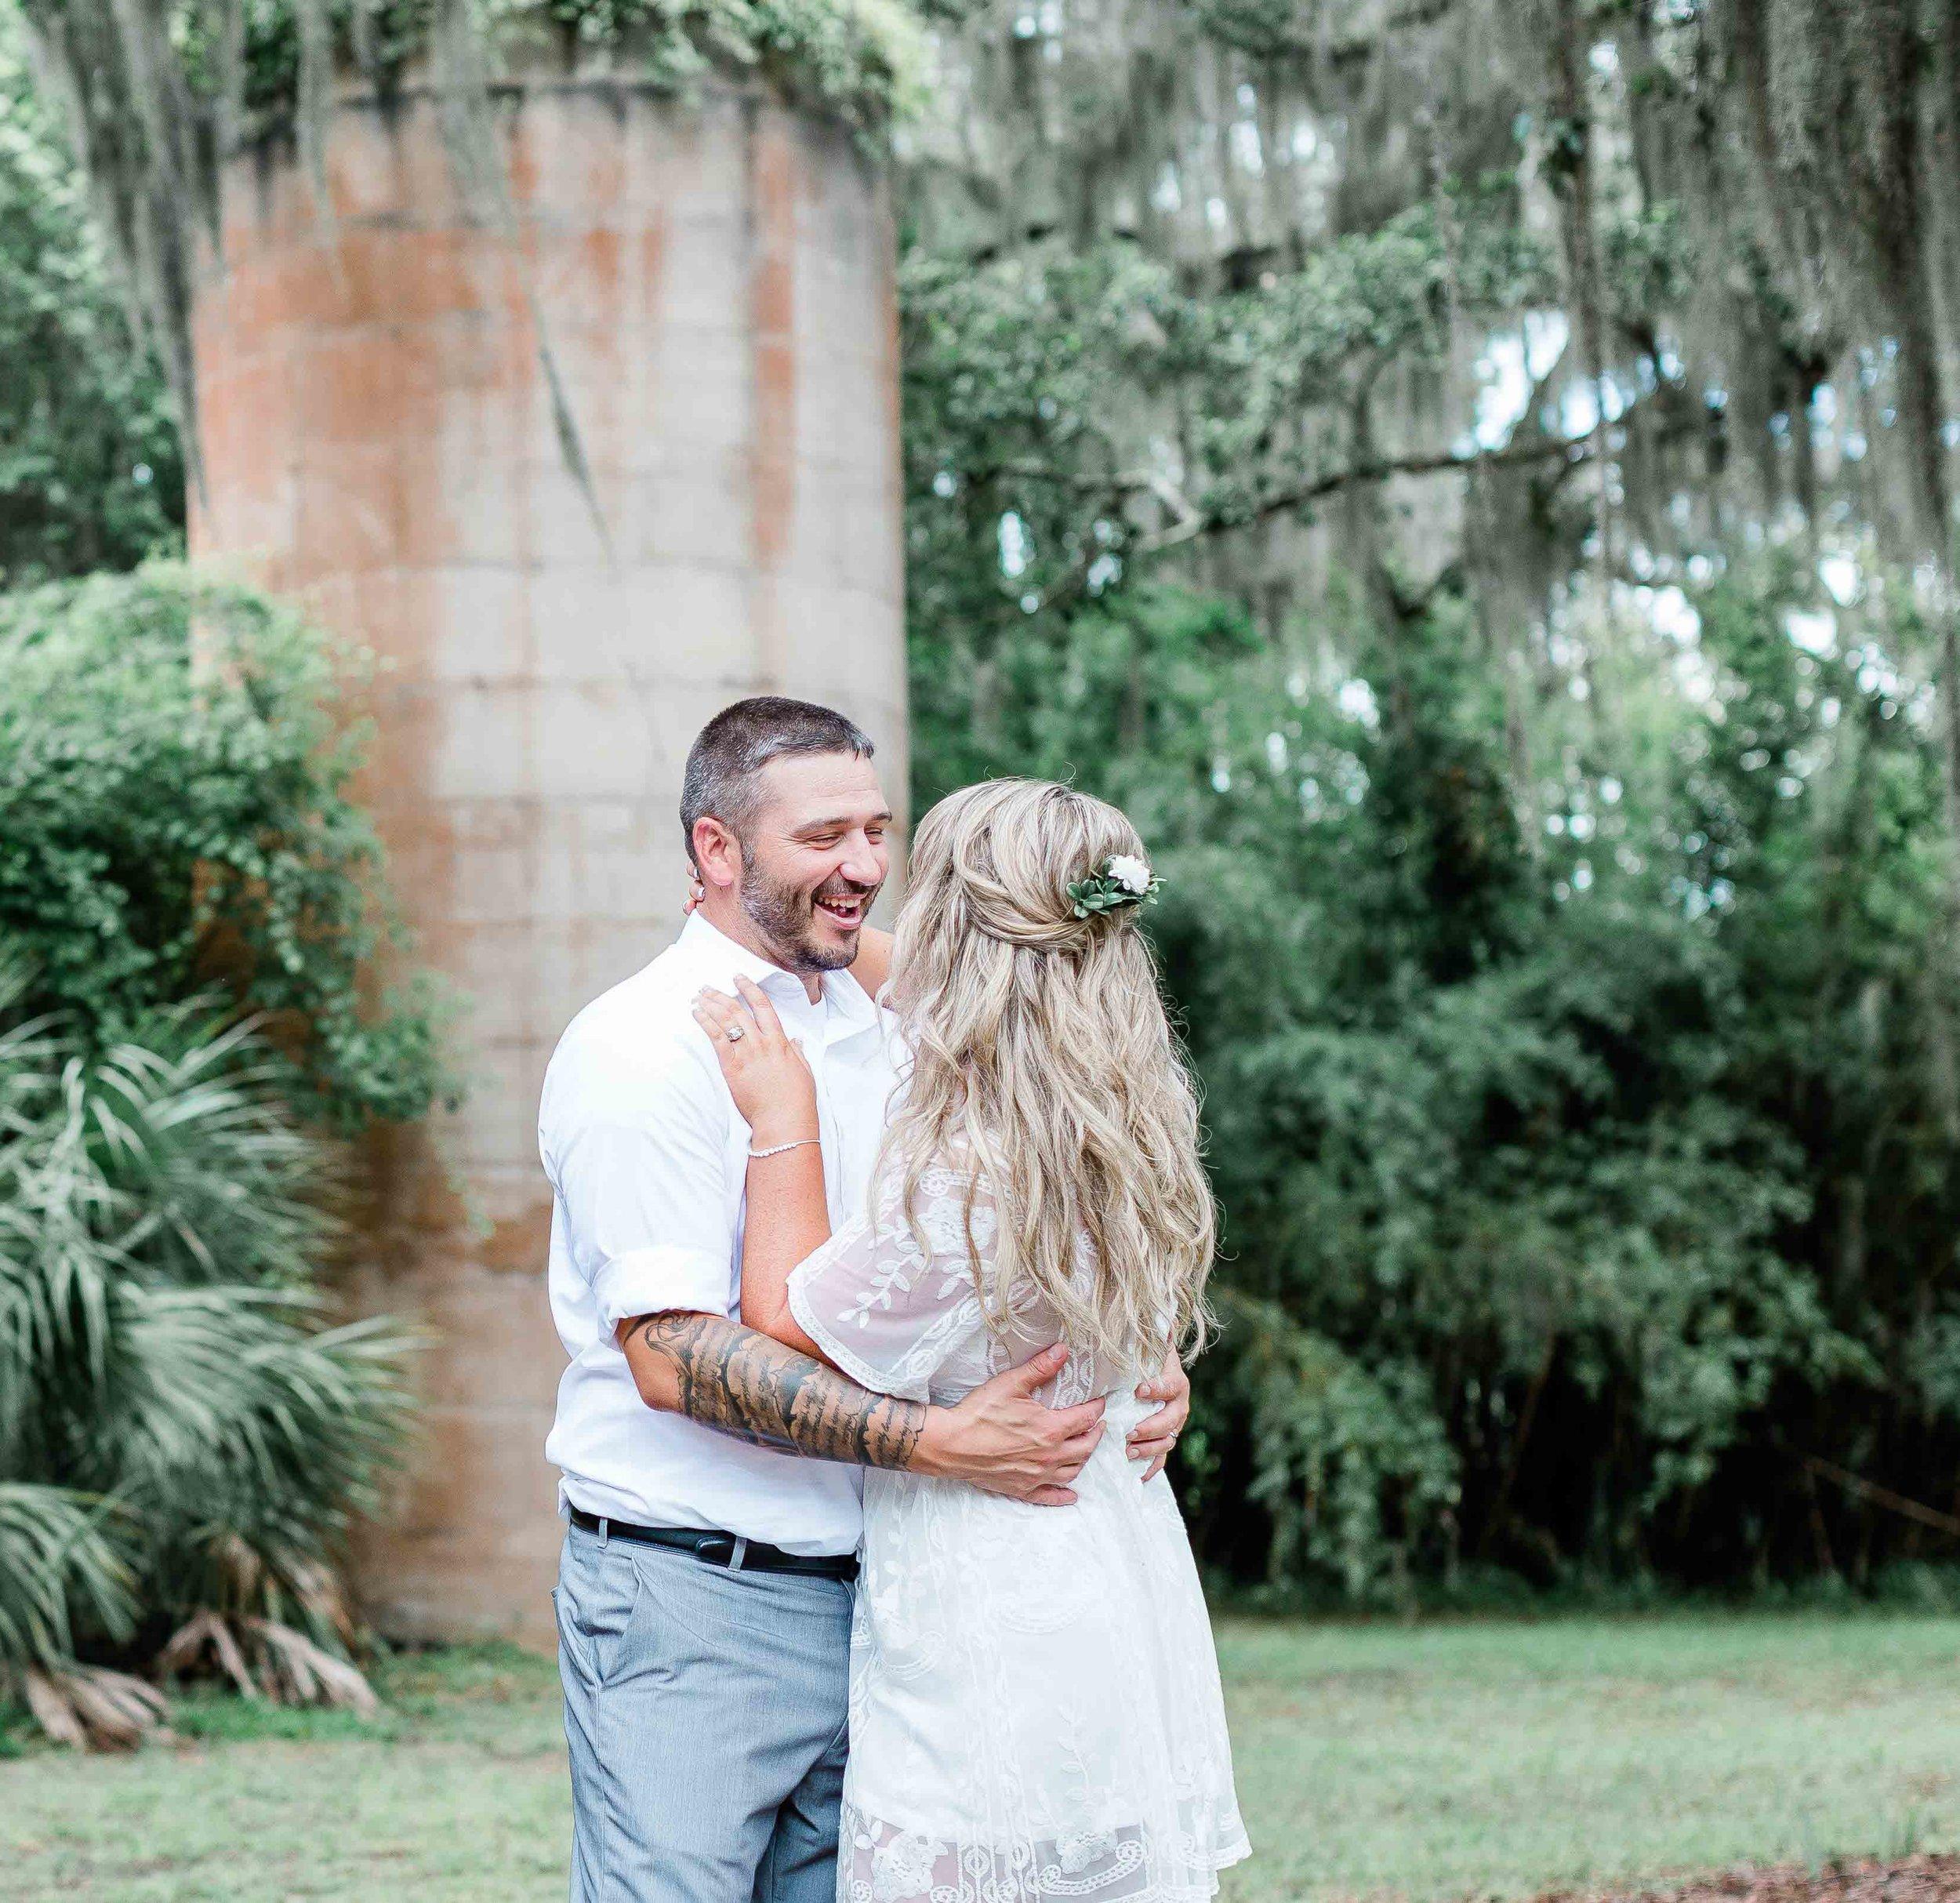 20190727Georgia-Wormlsoe Plantation-Simply Eloped-Savannah Wedding Photographer- Southern Lens Photography27.jpg